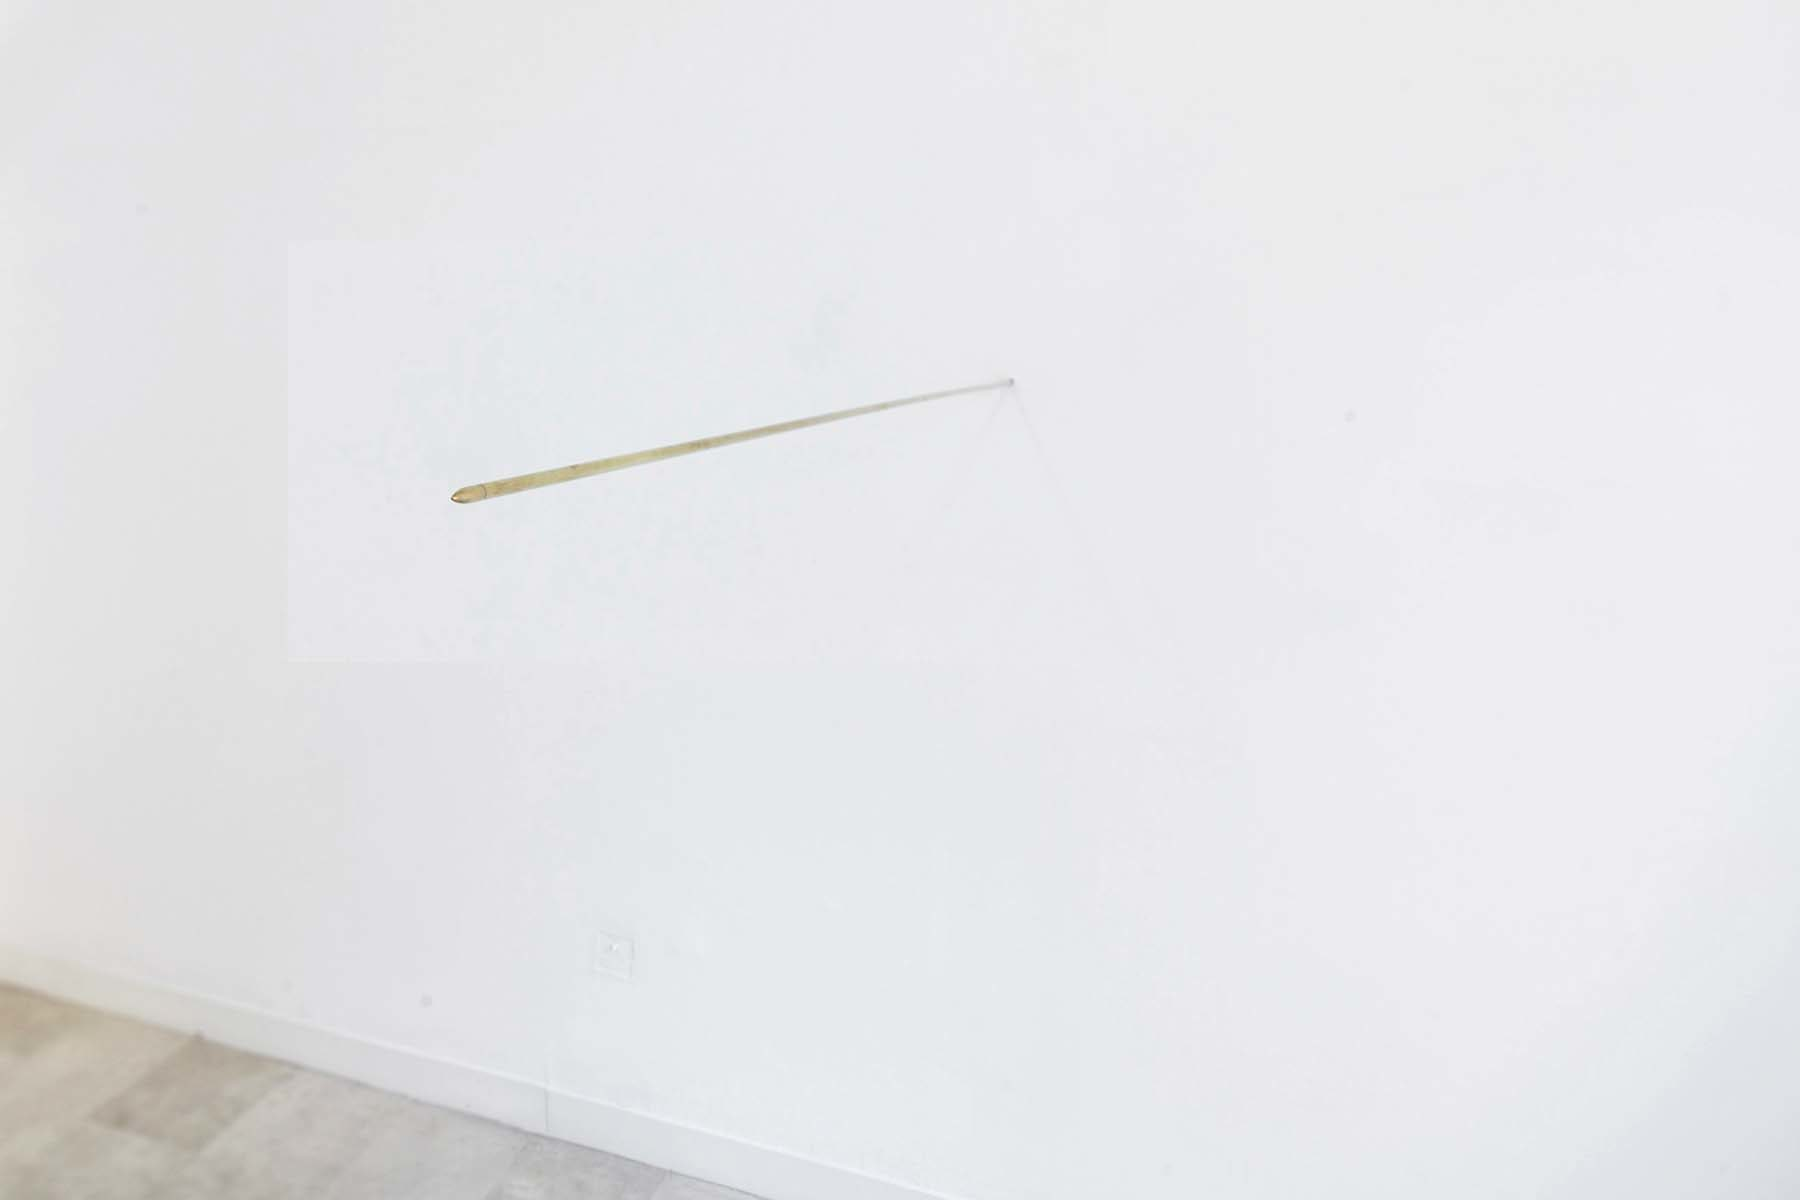 G. Morbin, Forza Nuova, 2005, bullett, brass, ∅ 0.8 cm x 160 cm